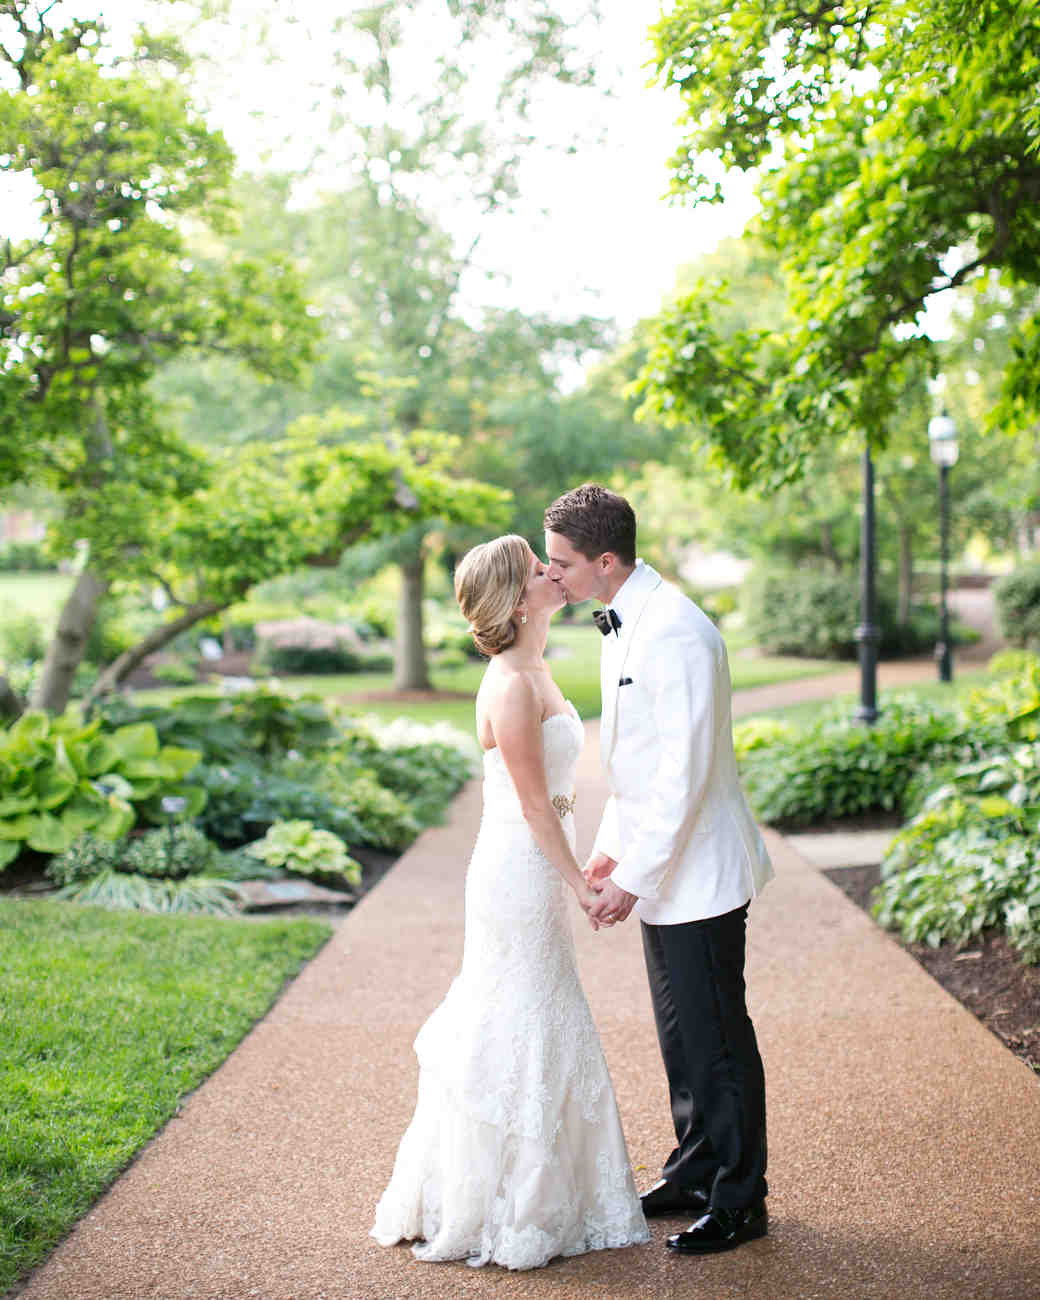 courtney-michael-wedding-20-s111677-0215.jpg